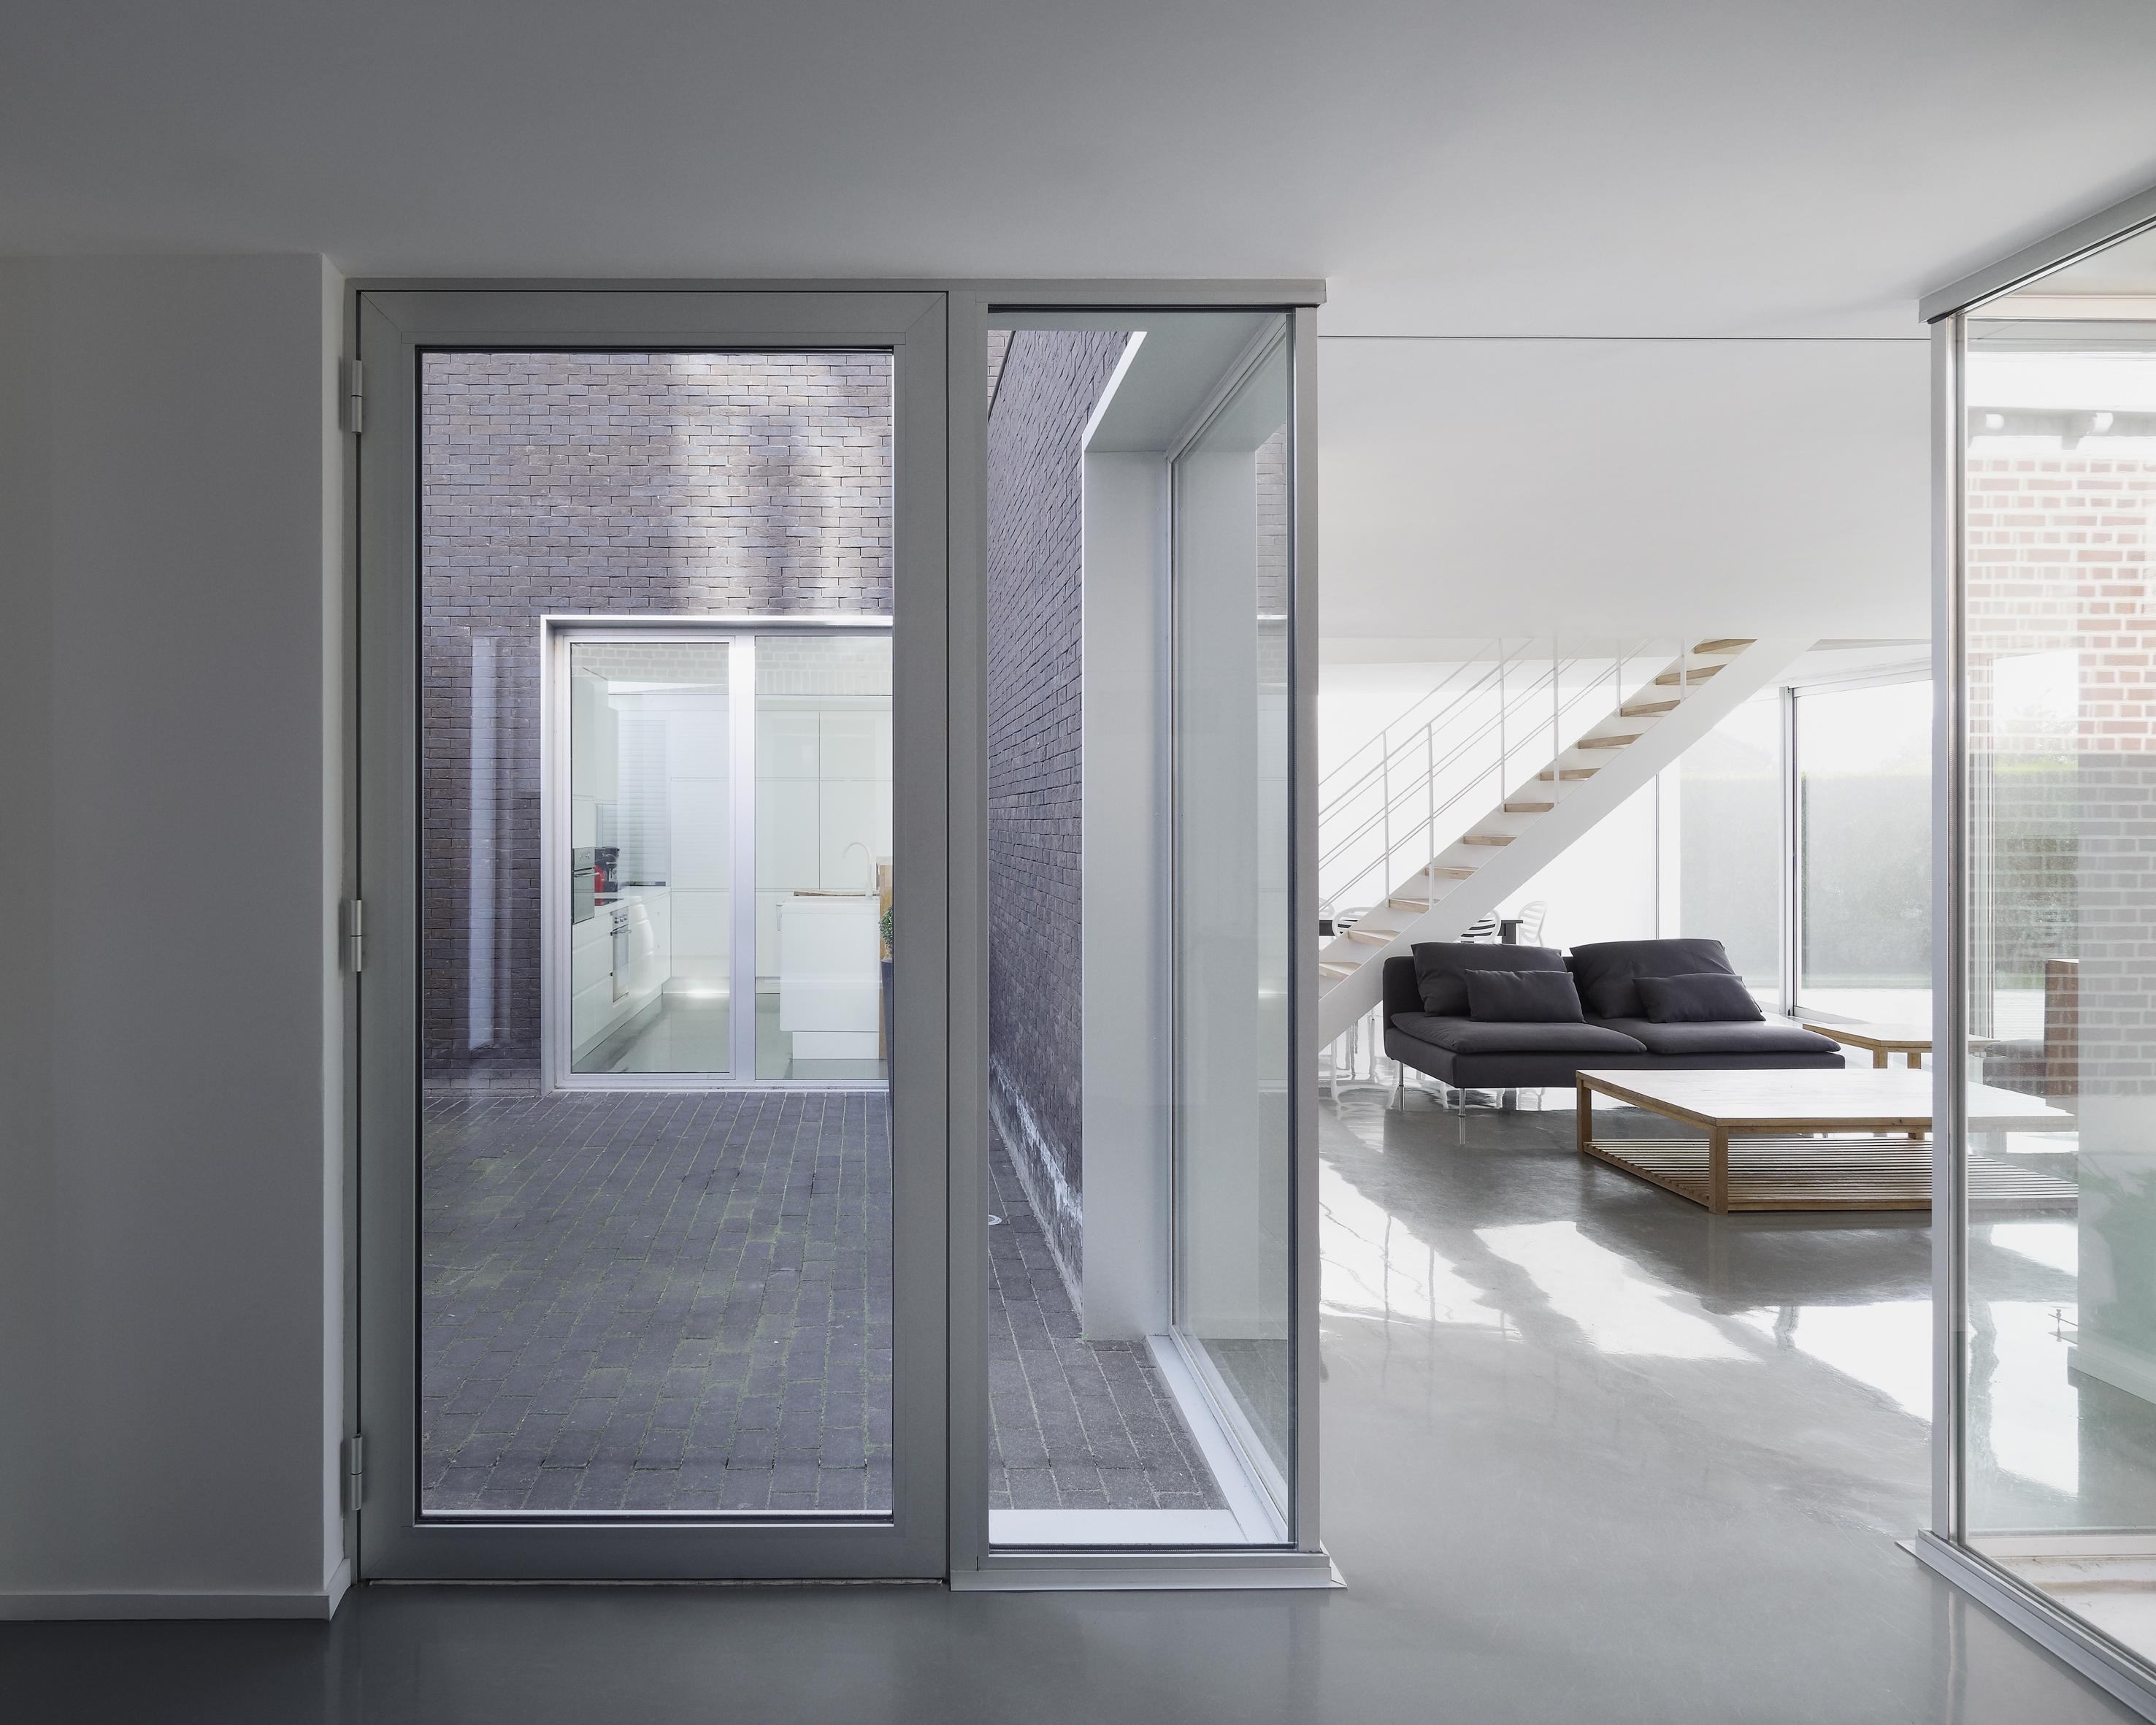 Porte fen tre aluminium technal for Reparation porte fenetre